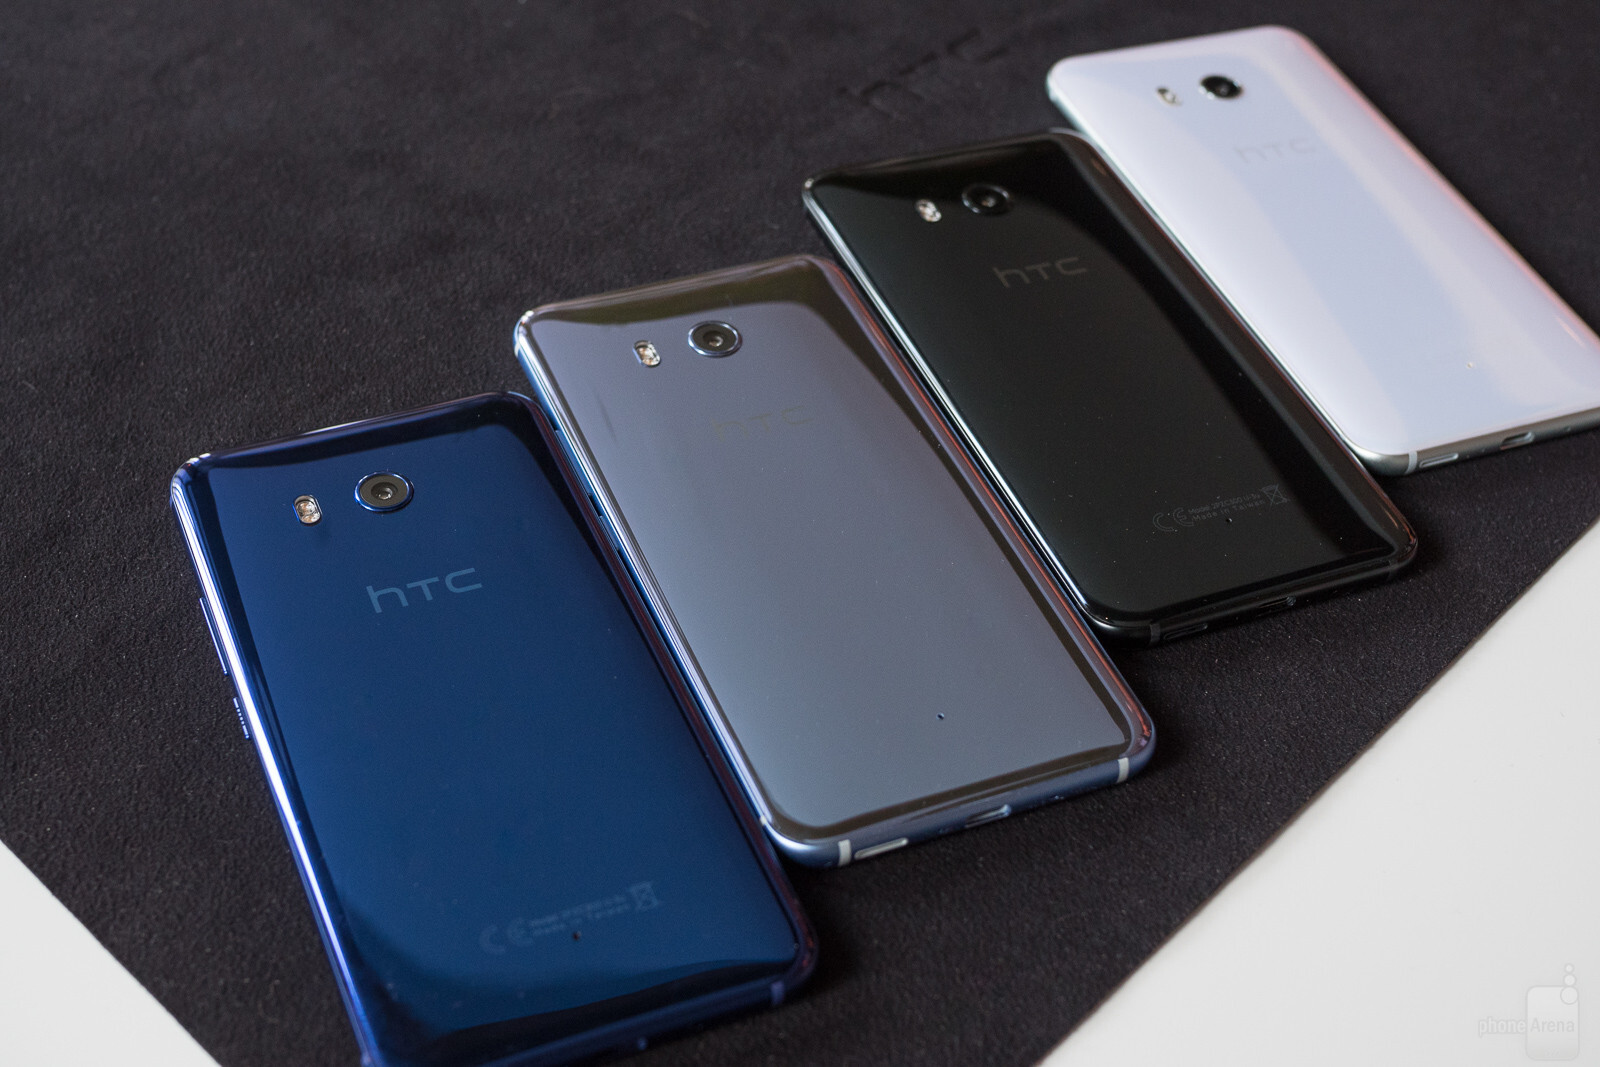 HTC U11 size comparison versus the Galaxy S8, S8+, LG G6